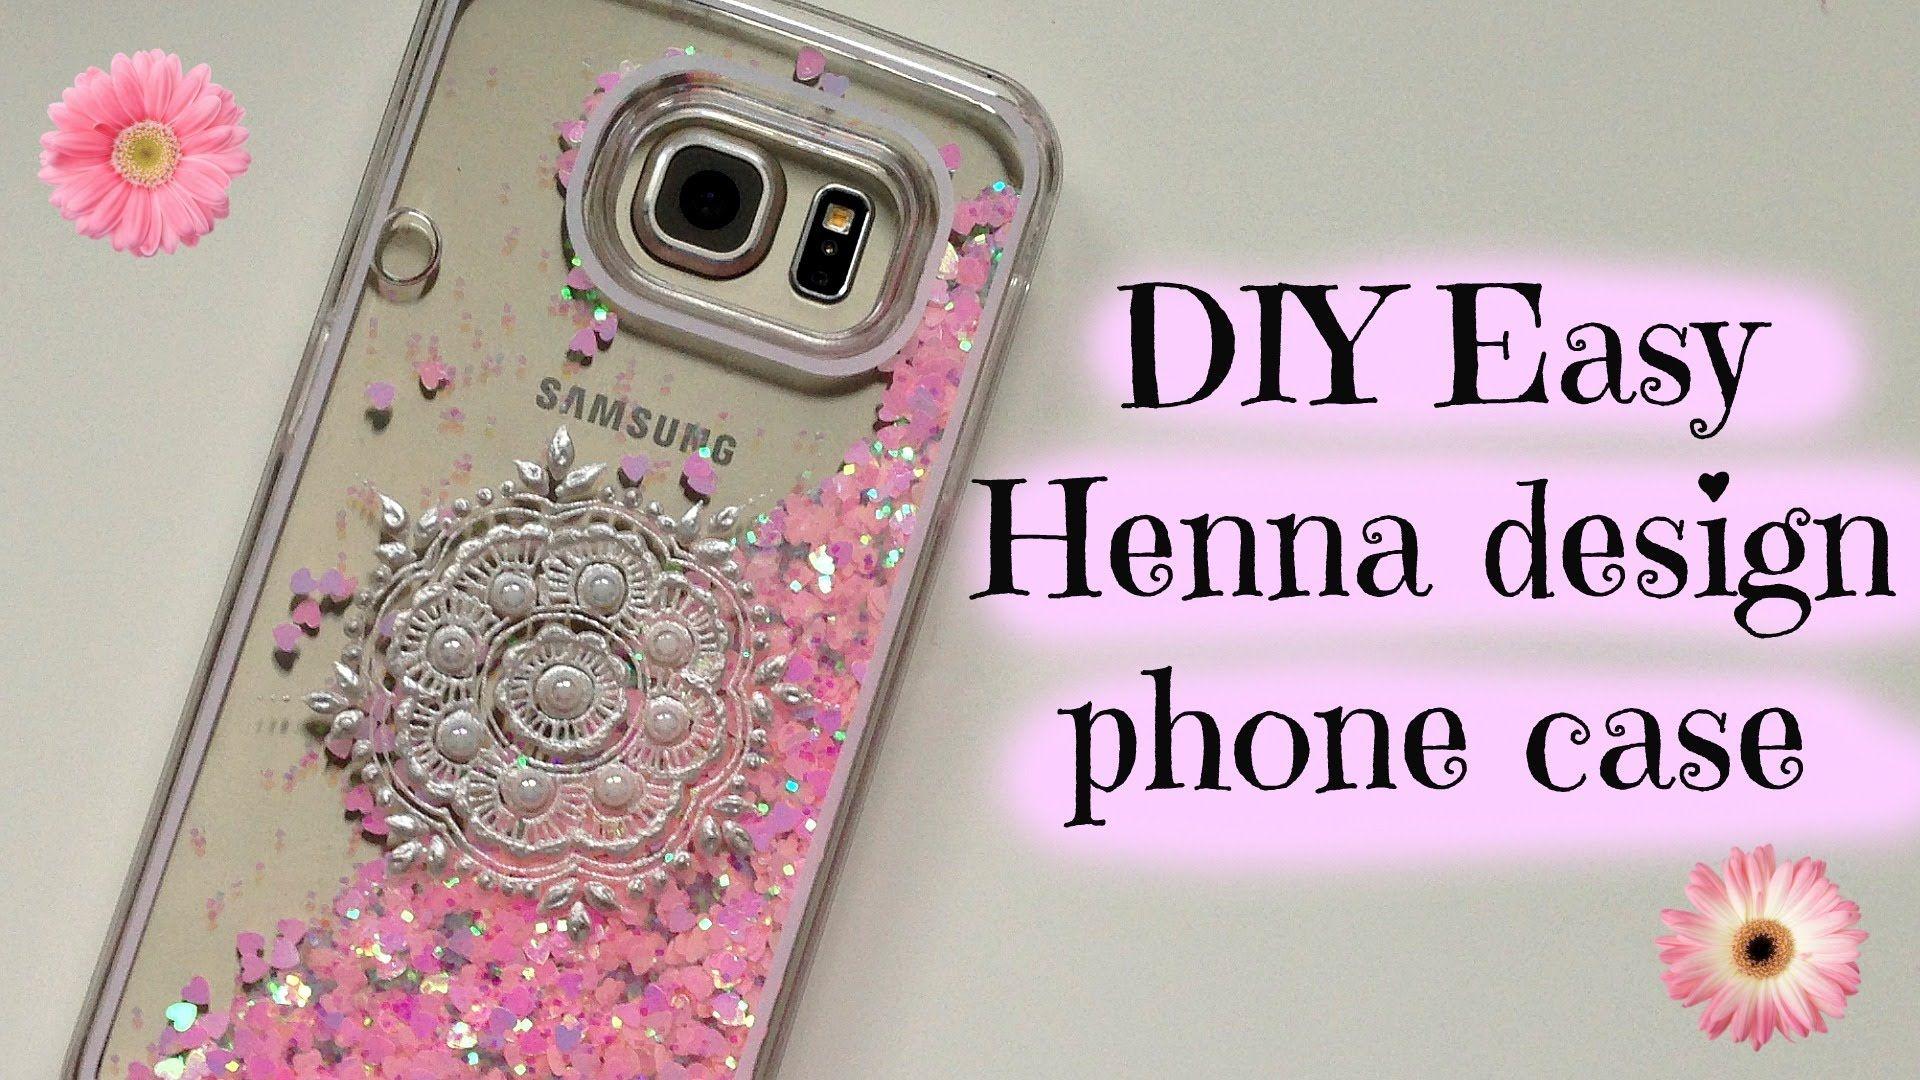 Diy Easy Decorated Phone Case Tutorial